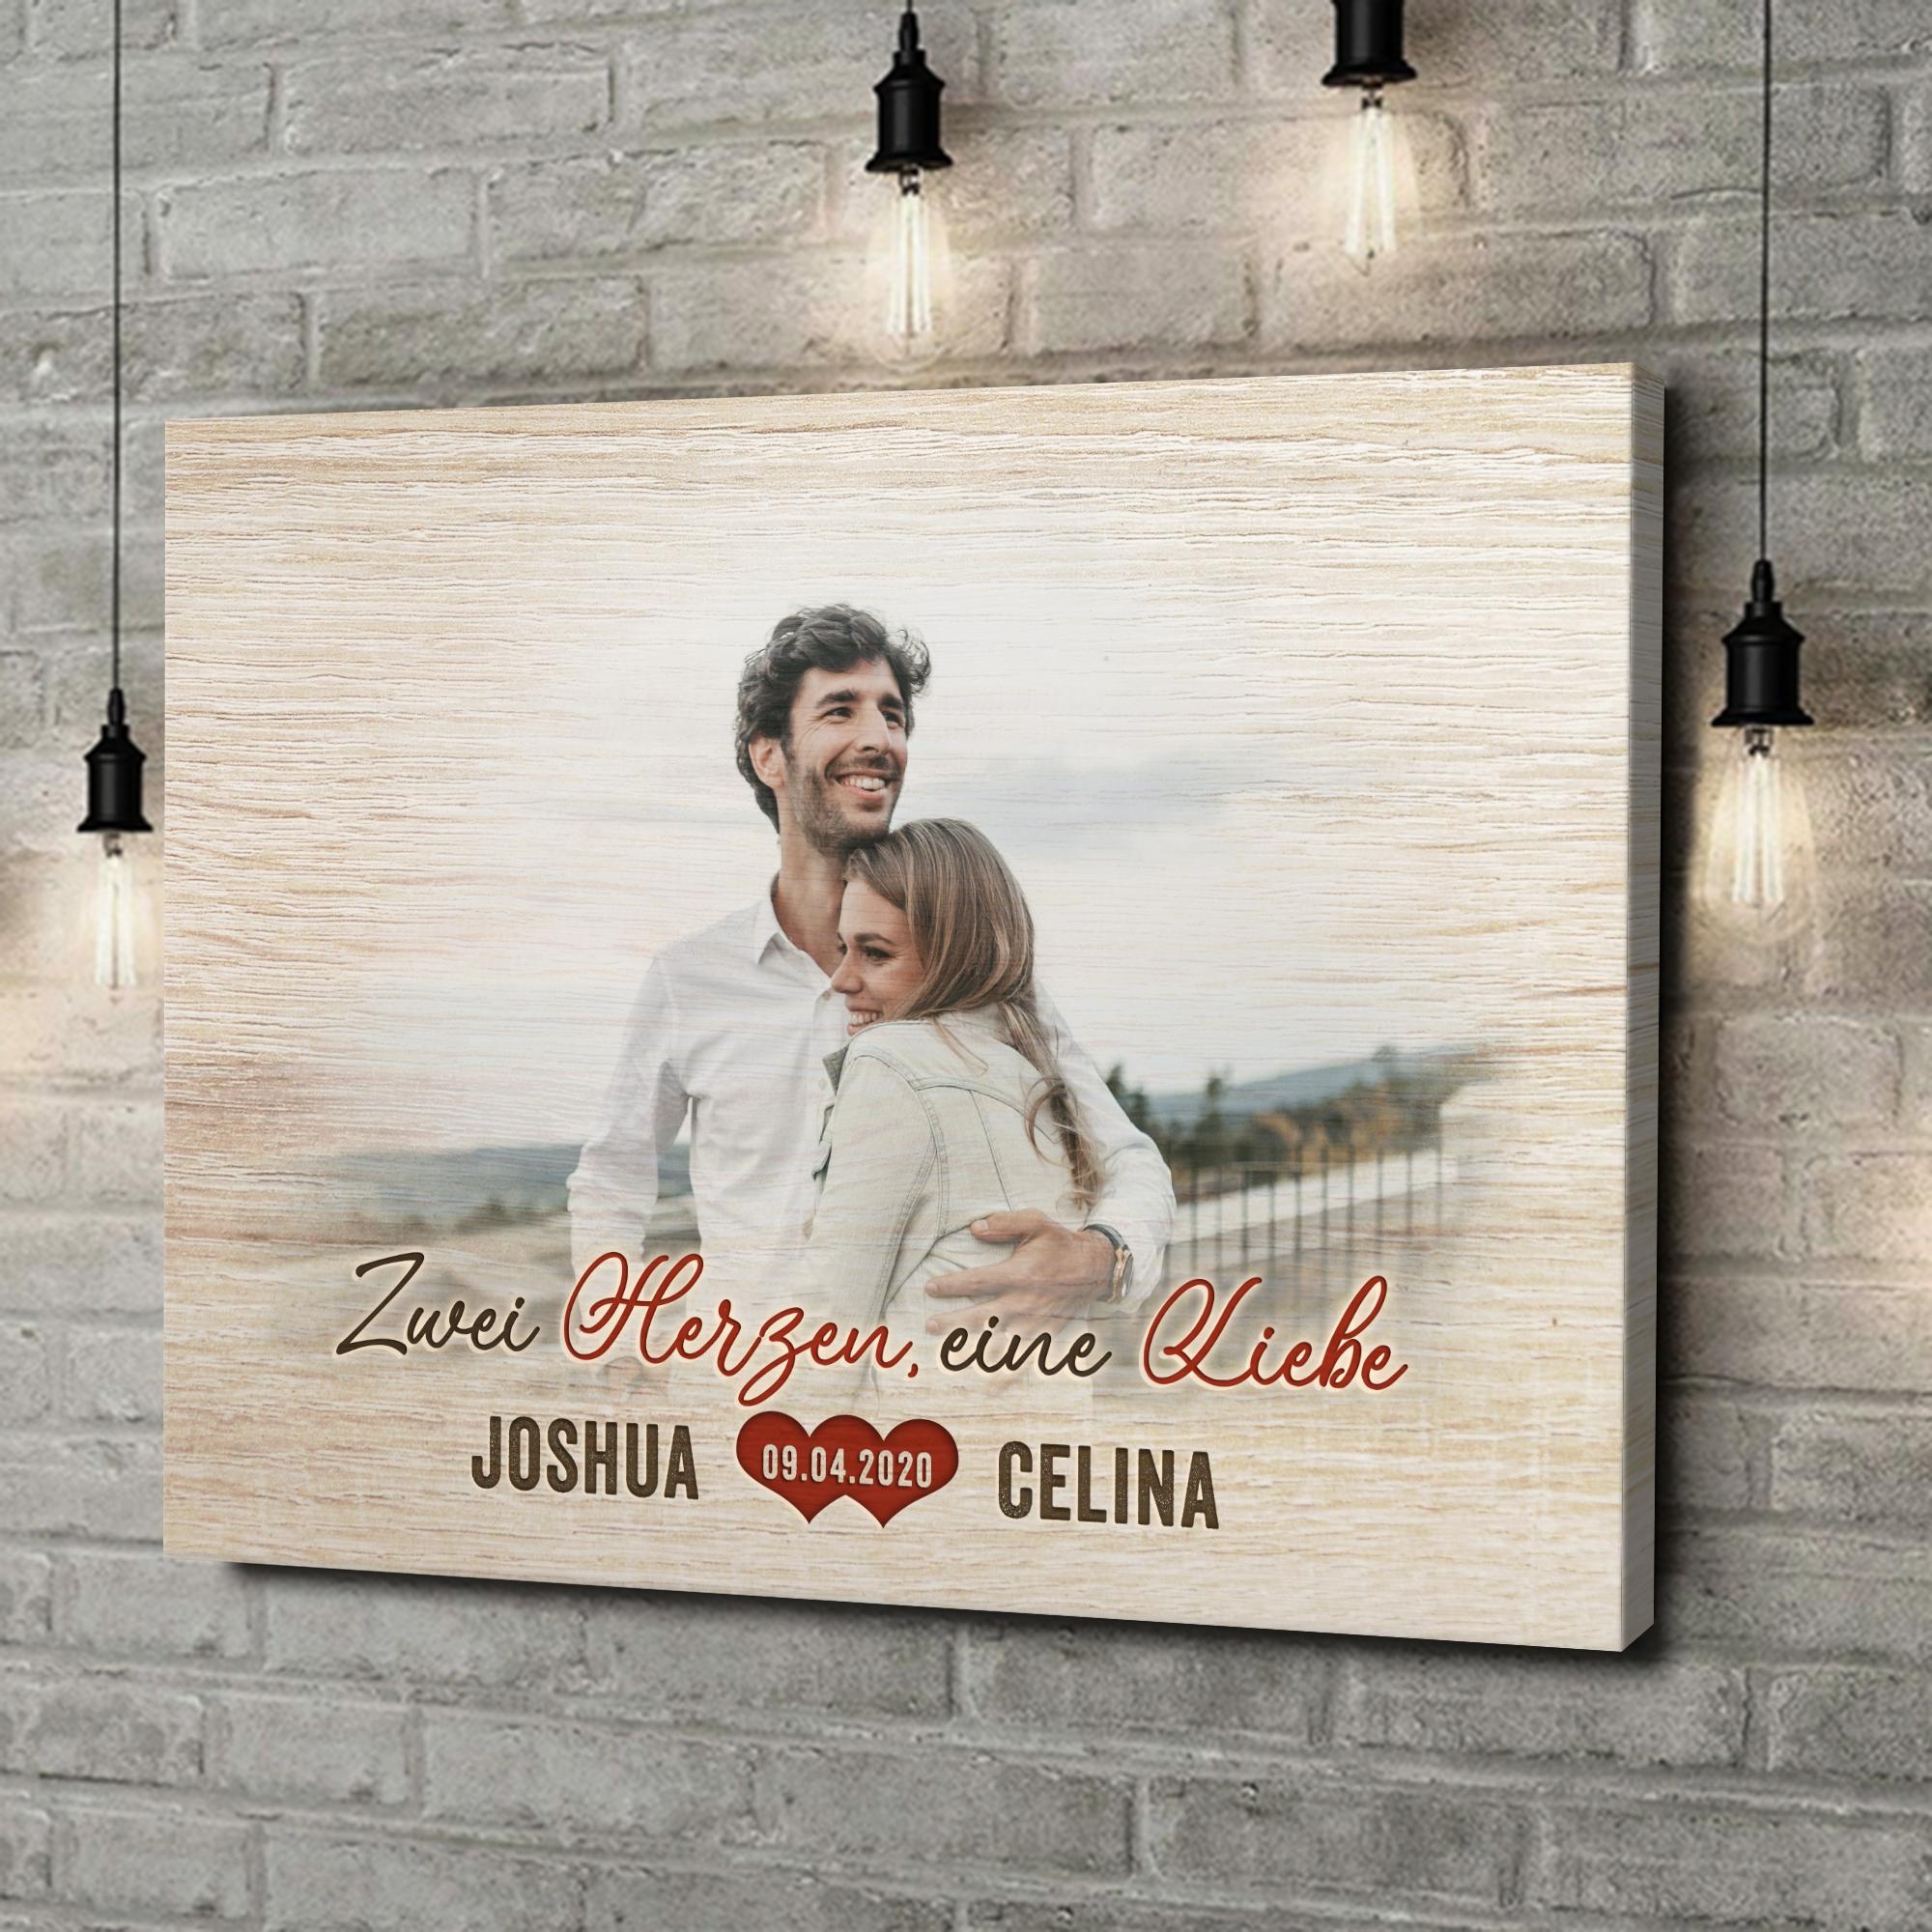 Leinwandbild personalisiert Romantisches Paar